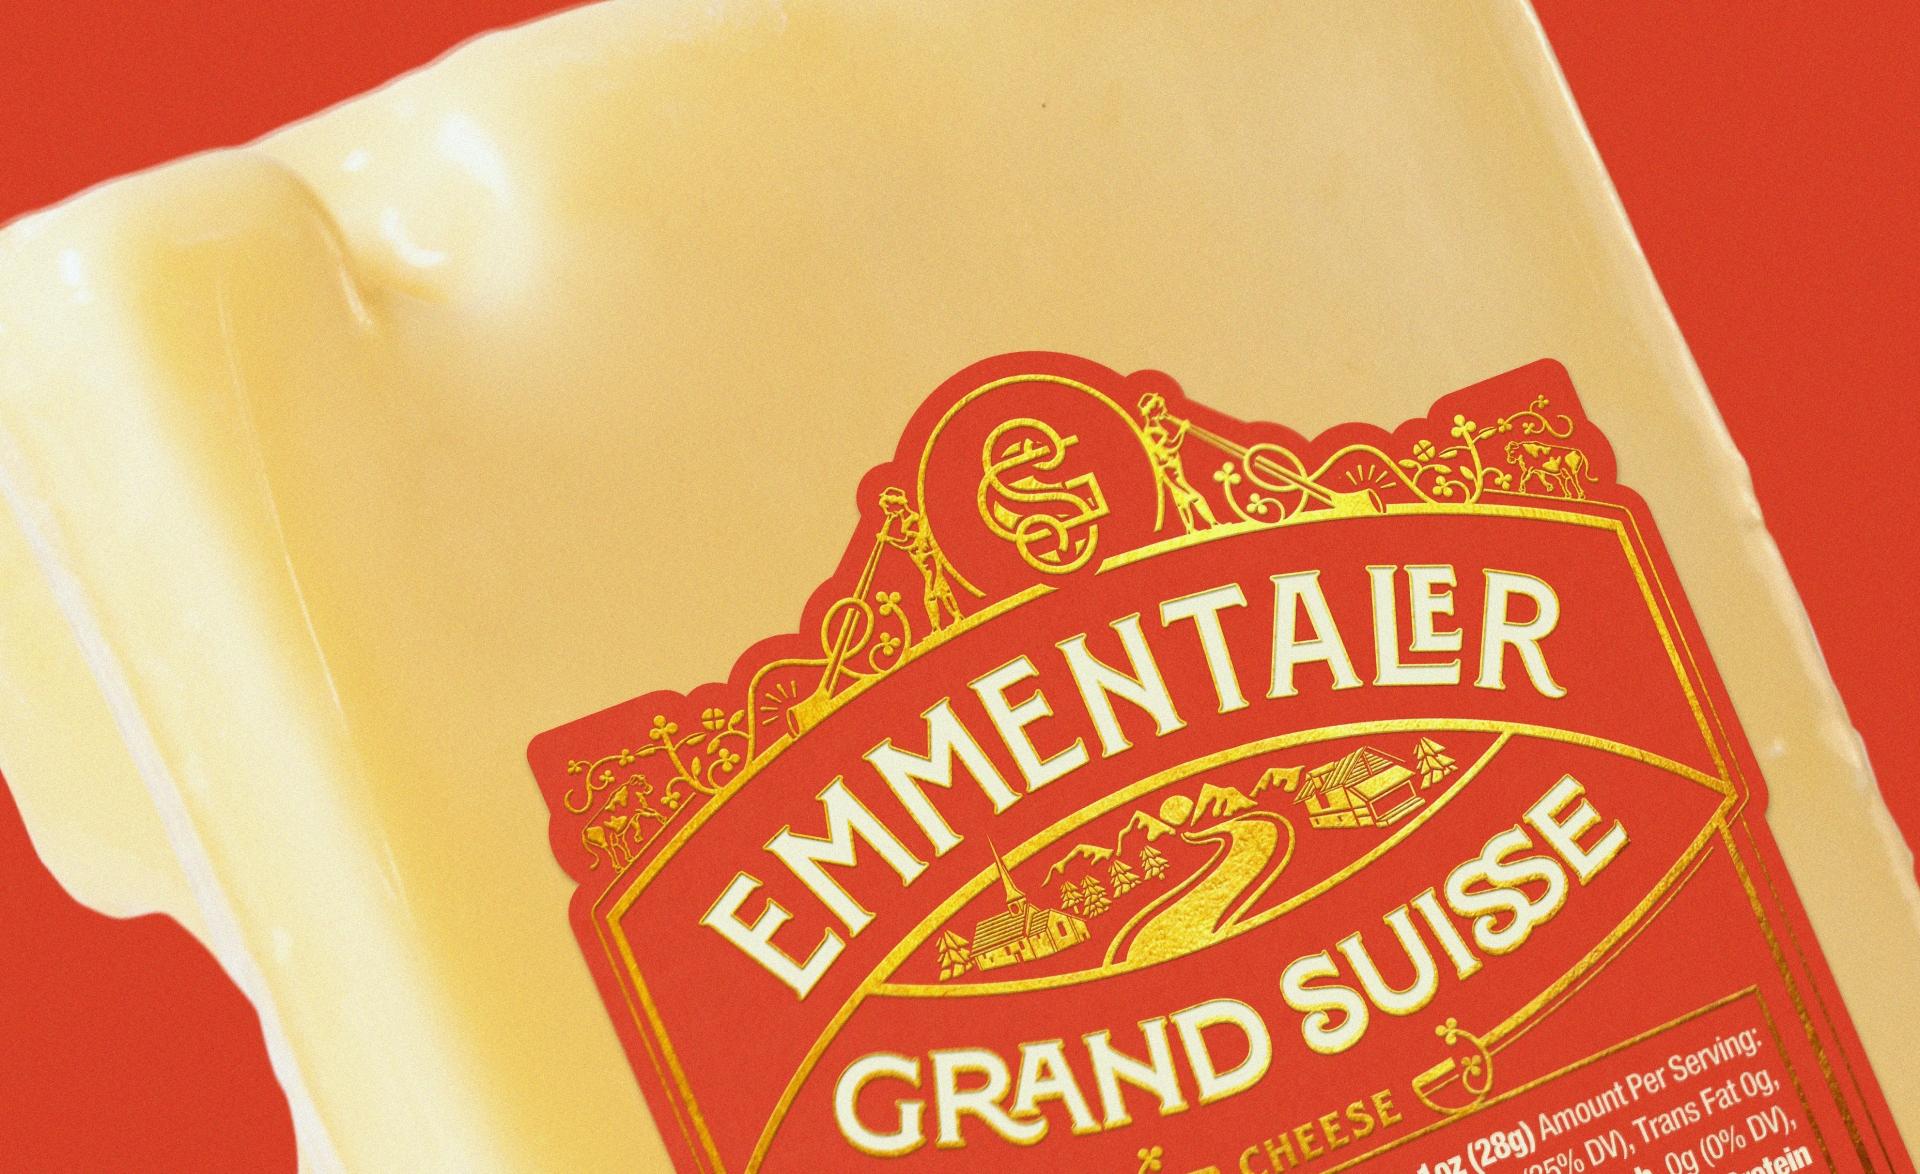 label-cheese-emmentaler-preview-grand-suisse-close-zeki-michael-design-branding-studio-packaging-red